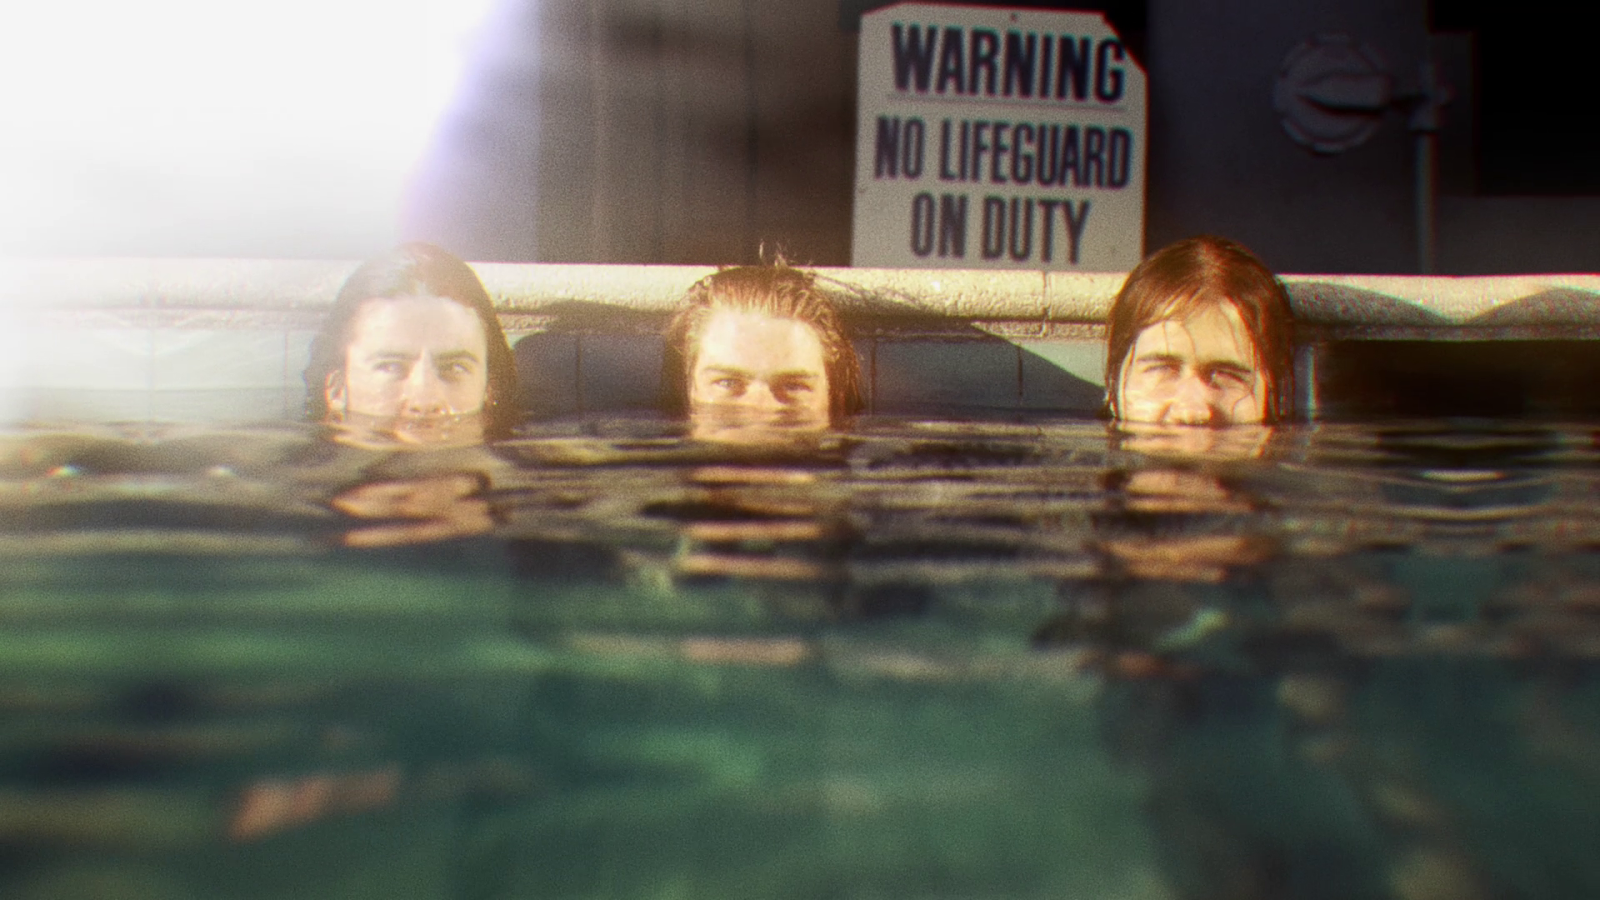 Kurt Cobain Montage Of Heck (2015) 1080p BD25 4